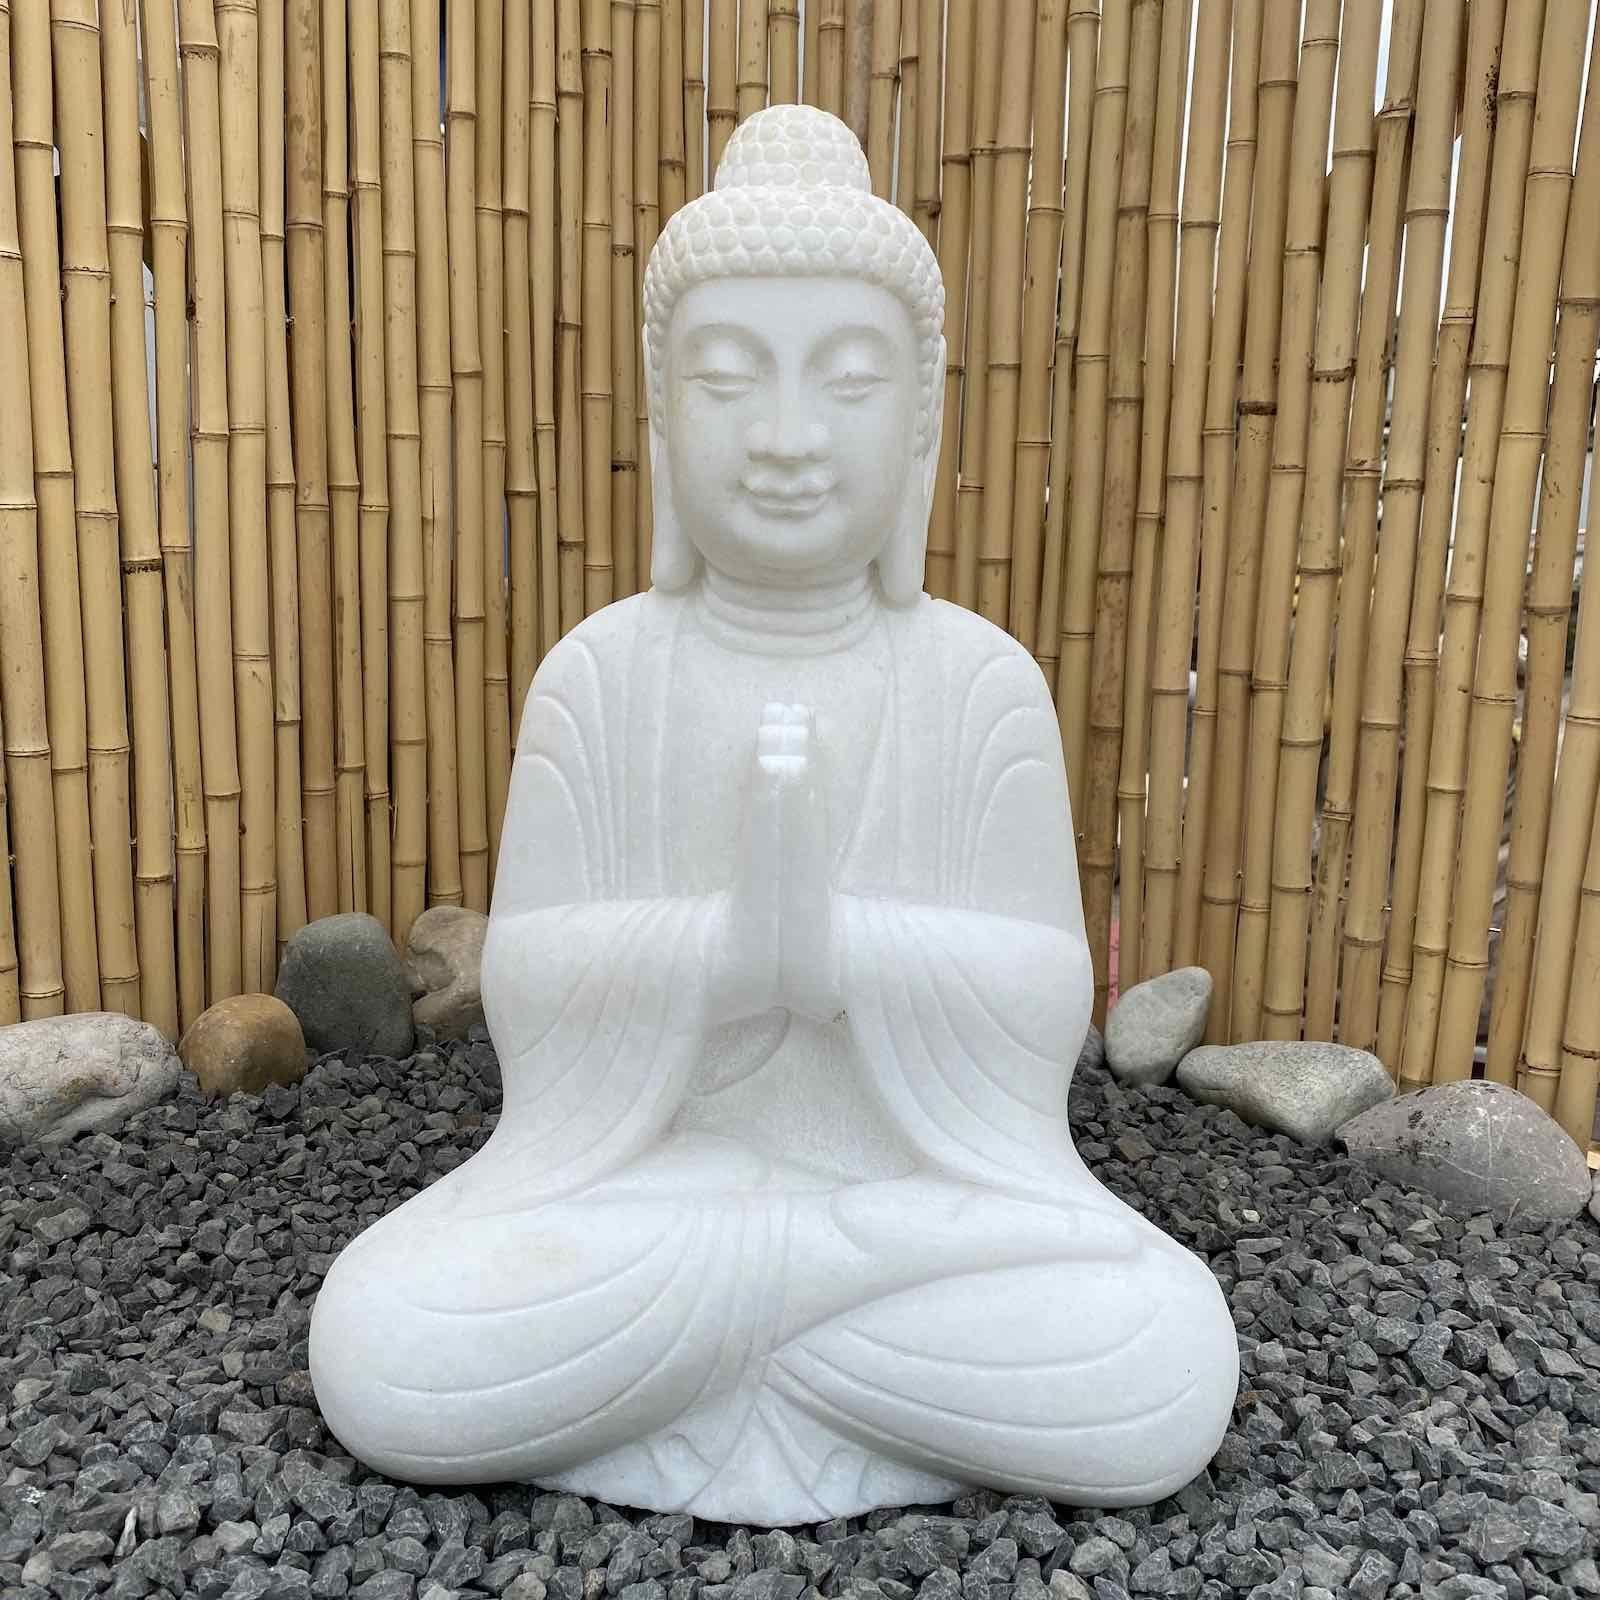 Garten Buddha Statue Marmor 62cm Namaskar Mudra Figur In 2020 Buddha Statuen Buddha Figur Lachender Buddha